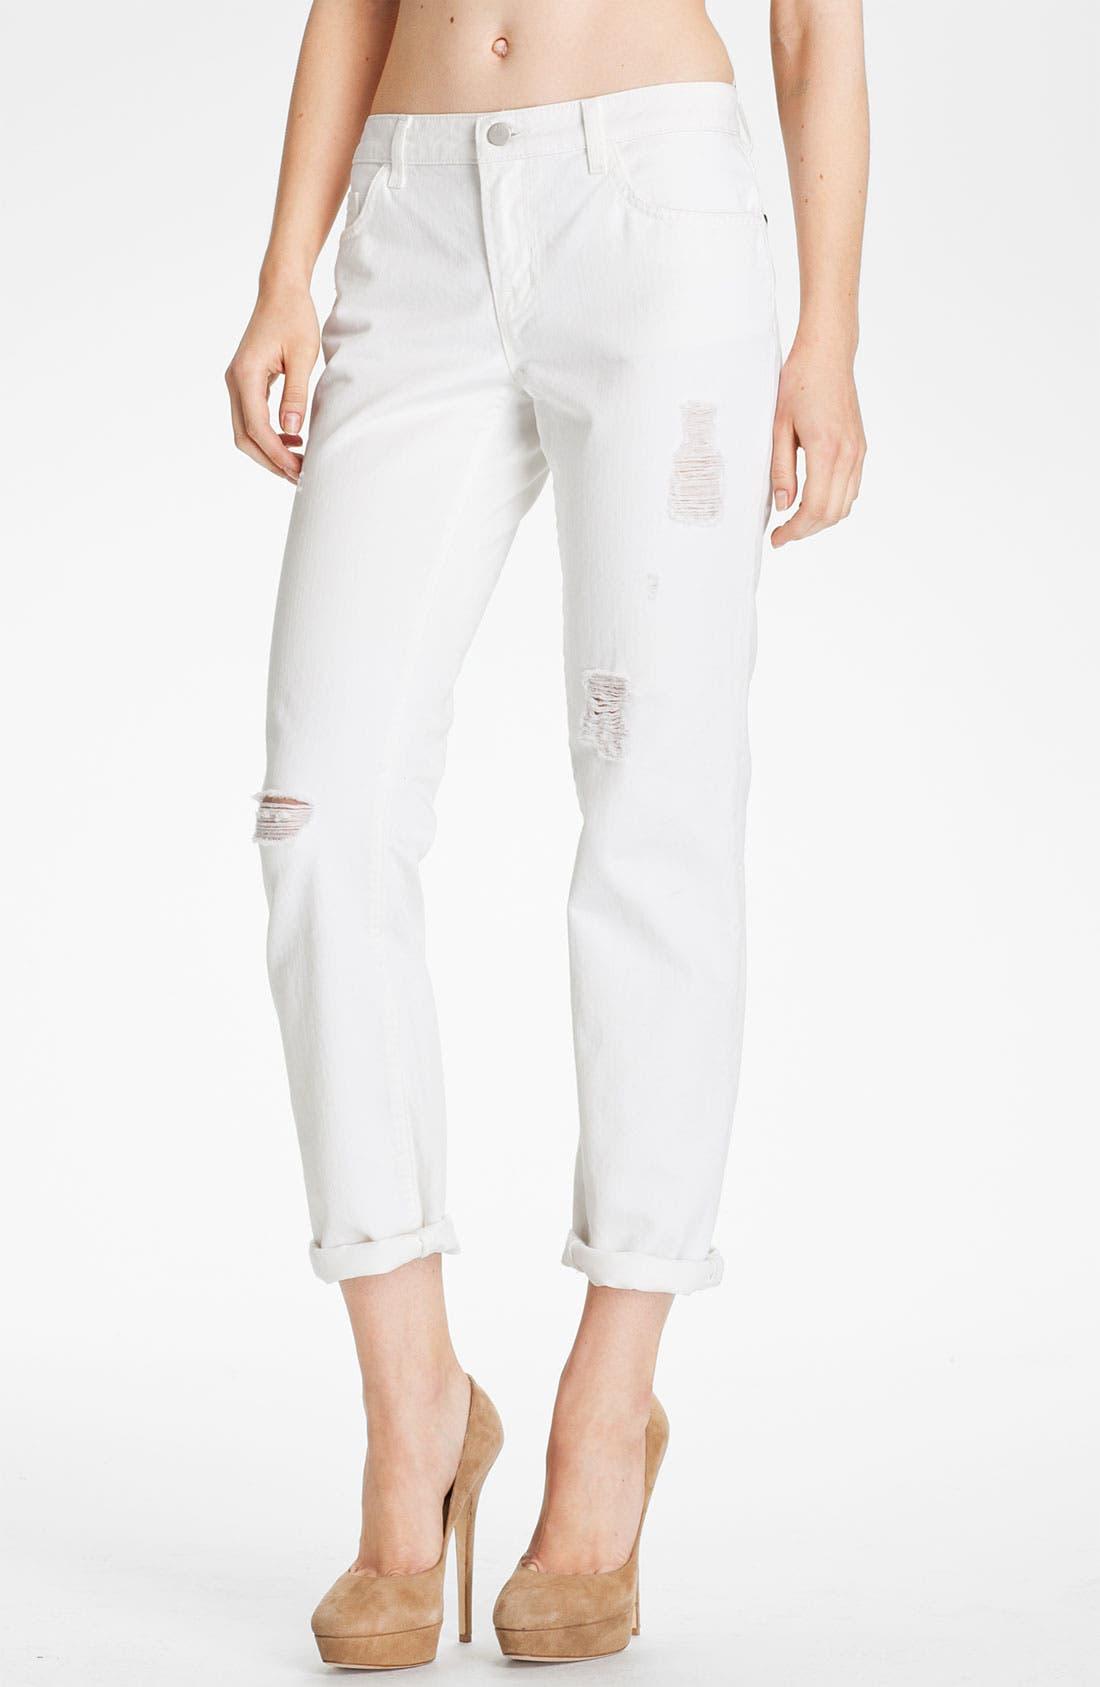 Main Image - J Brand 'Aidan' Distressed Boyfriend Fit Jeans (White Destructed)